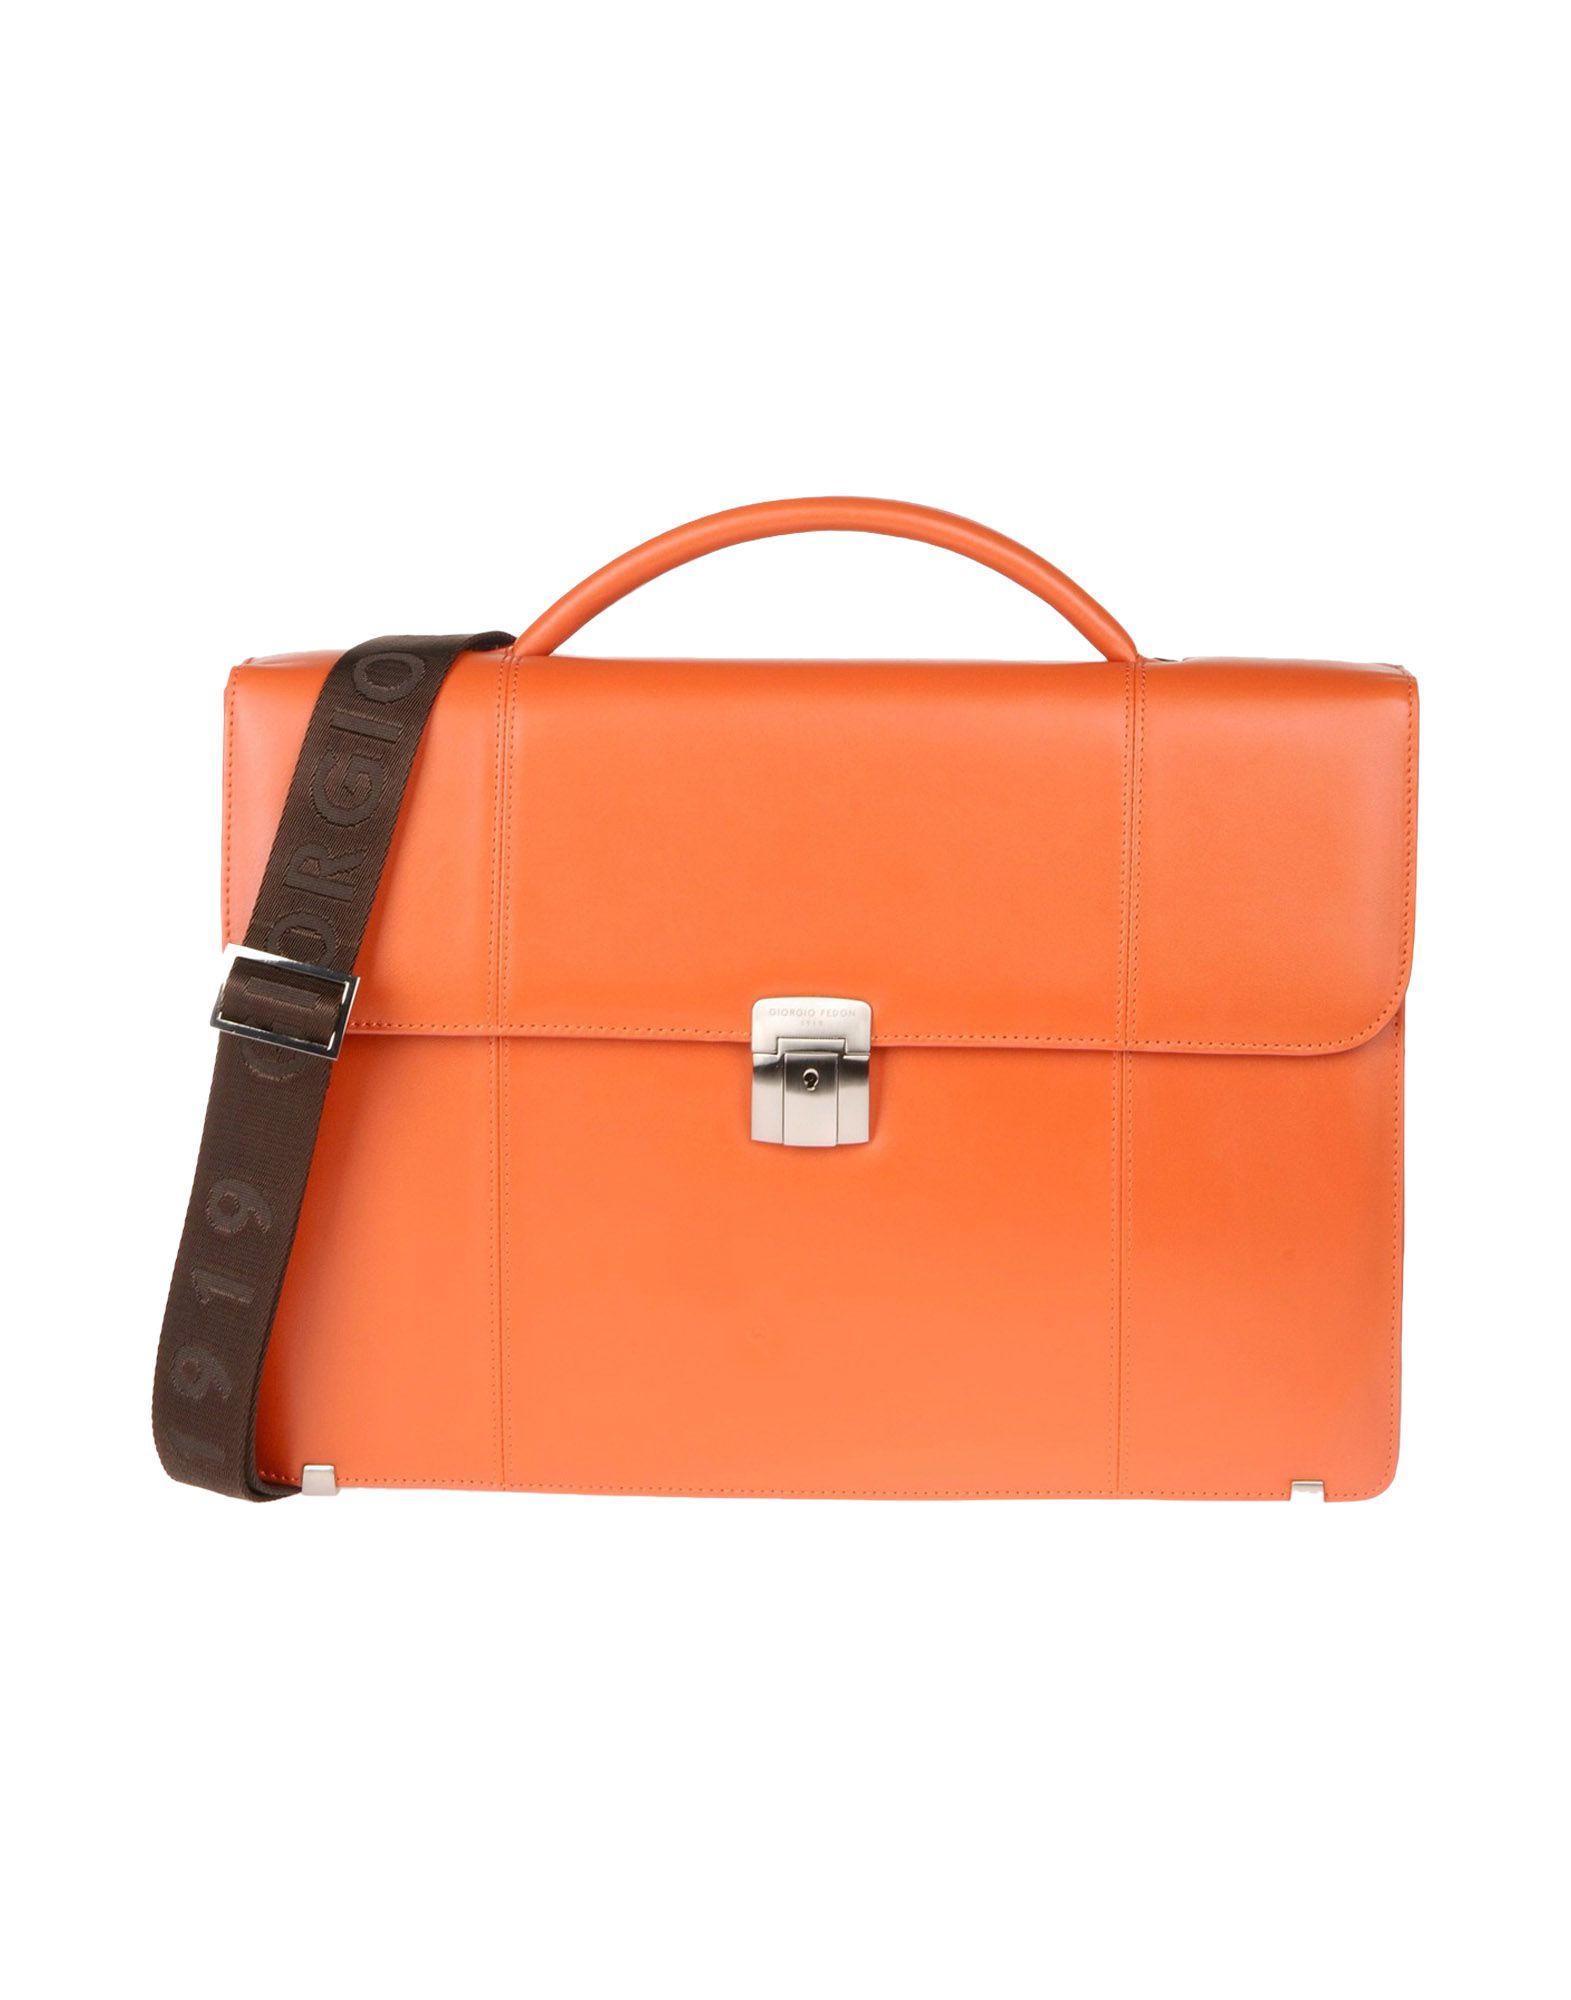 Giorgio fedon Work Bags in Orange